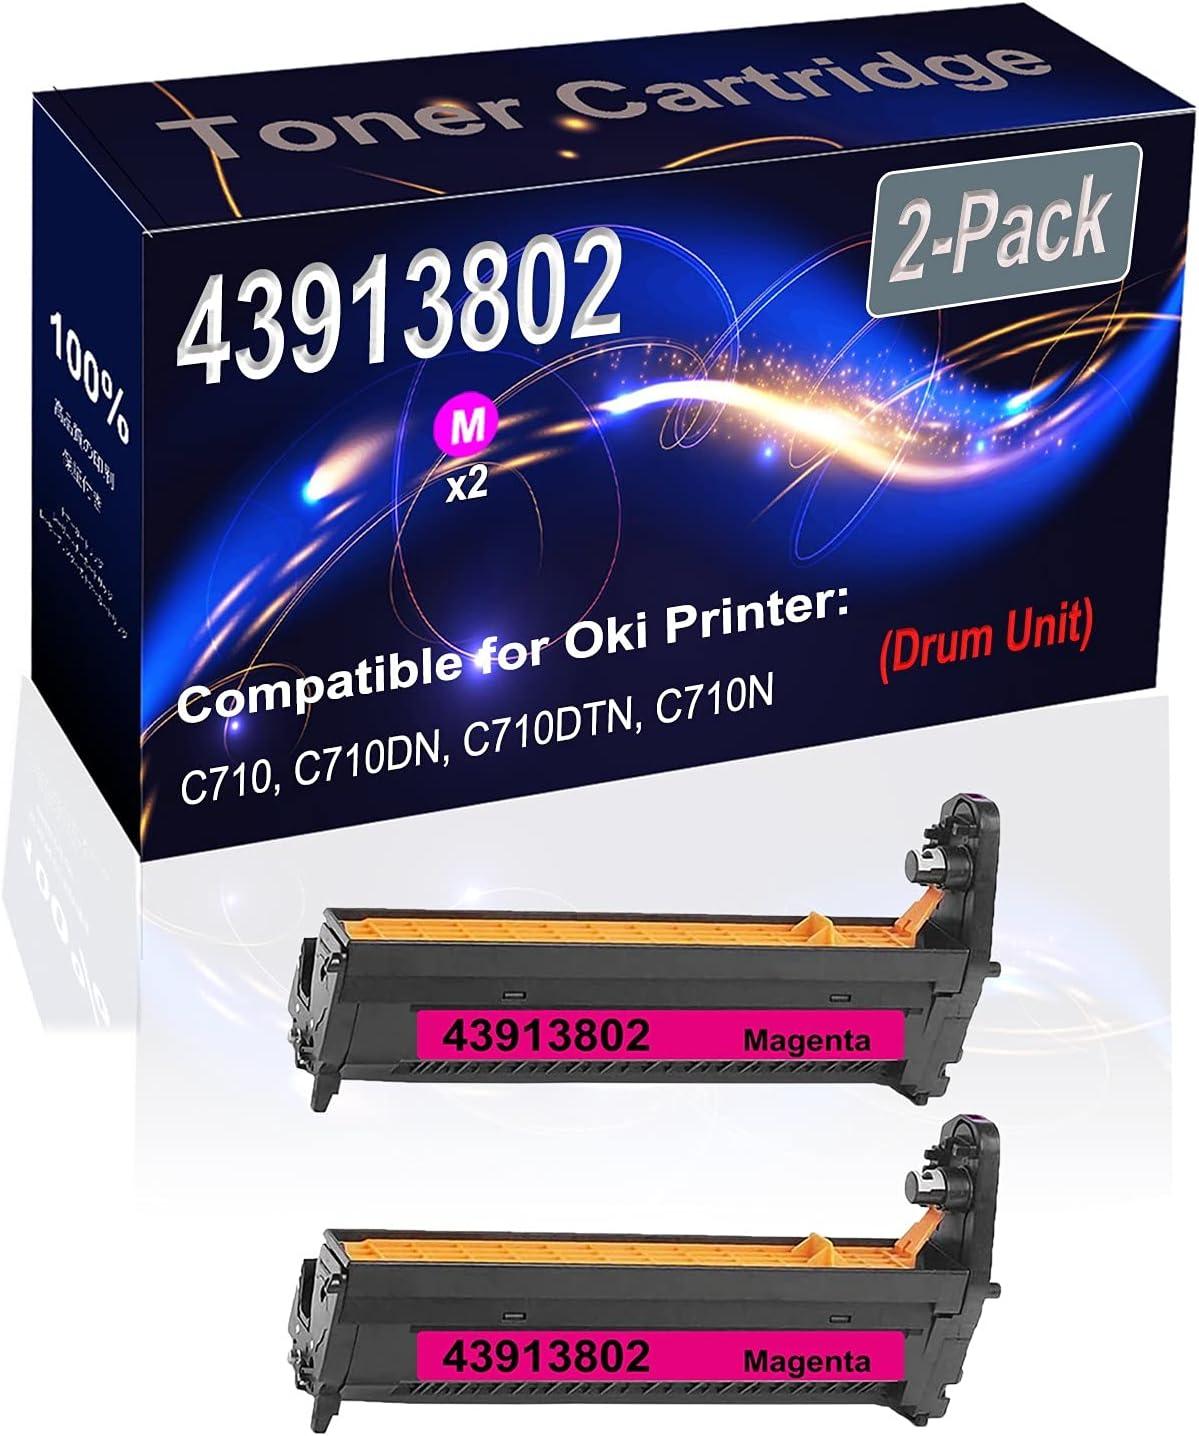 2-Pack (Magenta) Compatible High Capacity 43913802 Printer Drum Unit Used for Oki C710, C710DN, C710DTN, C710N Printer